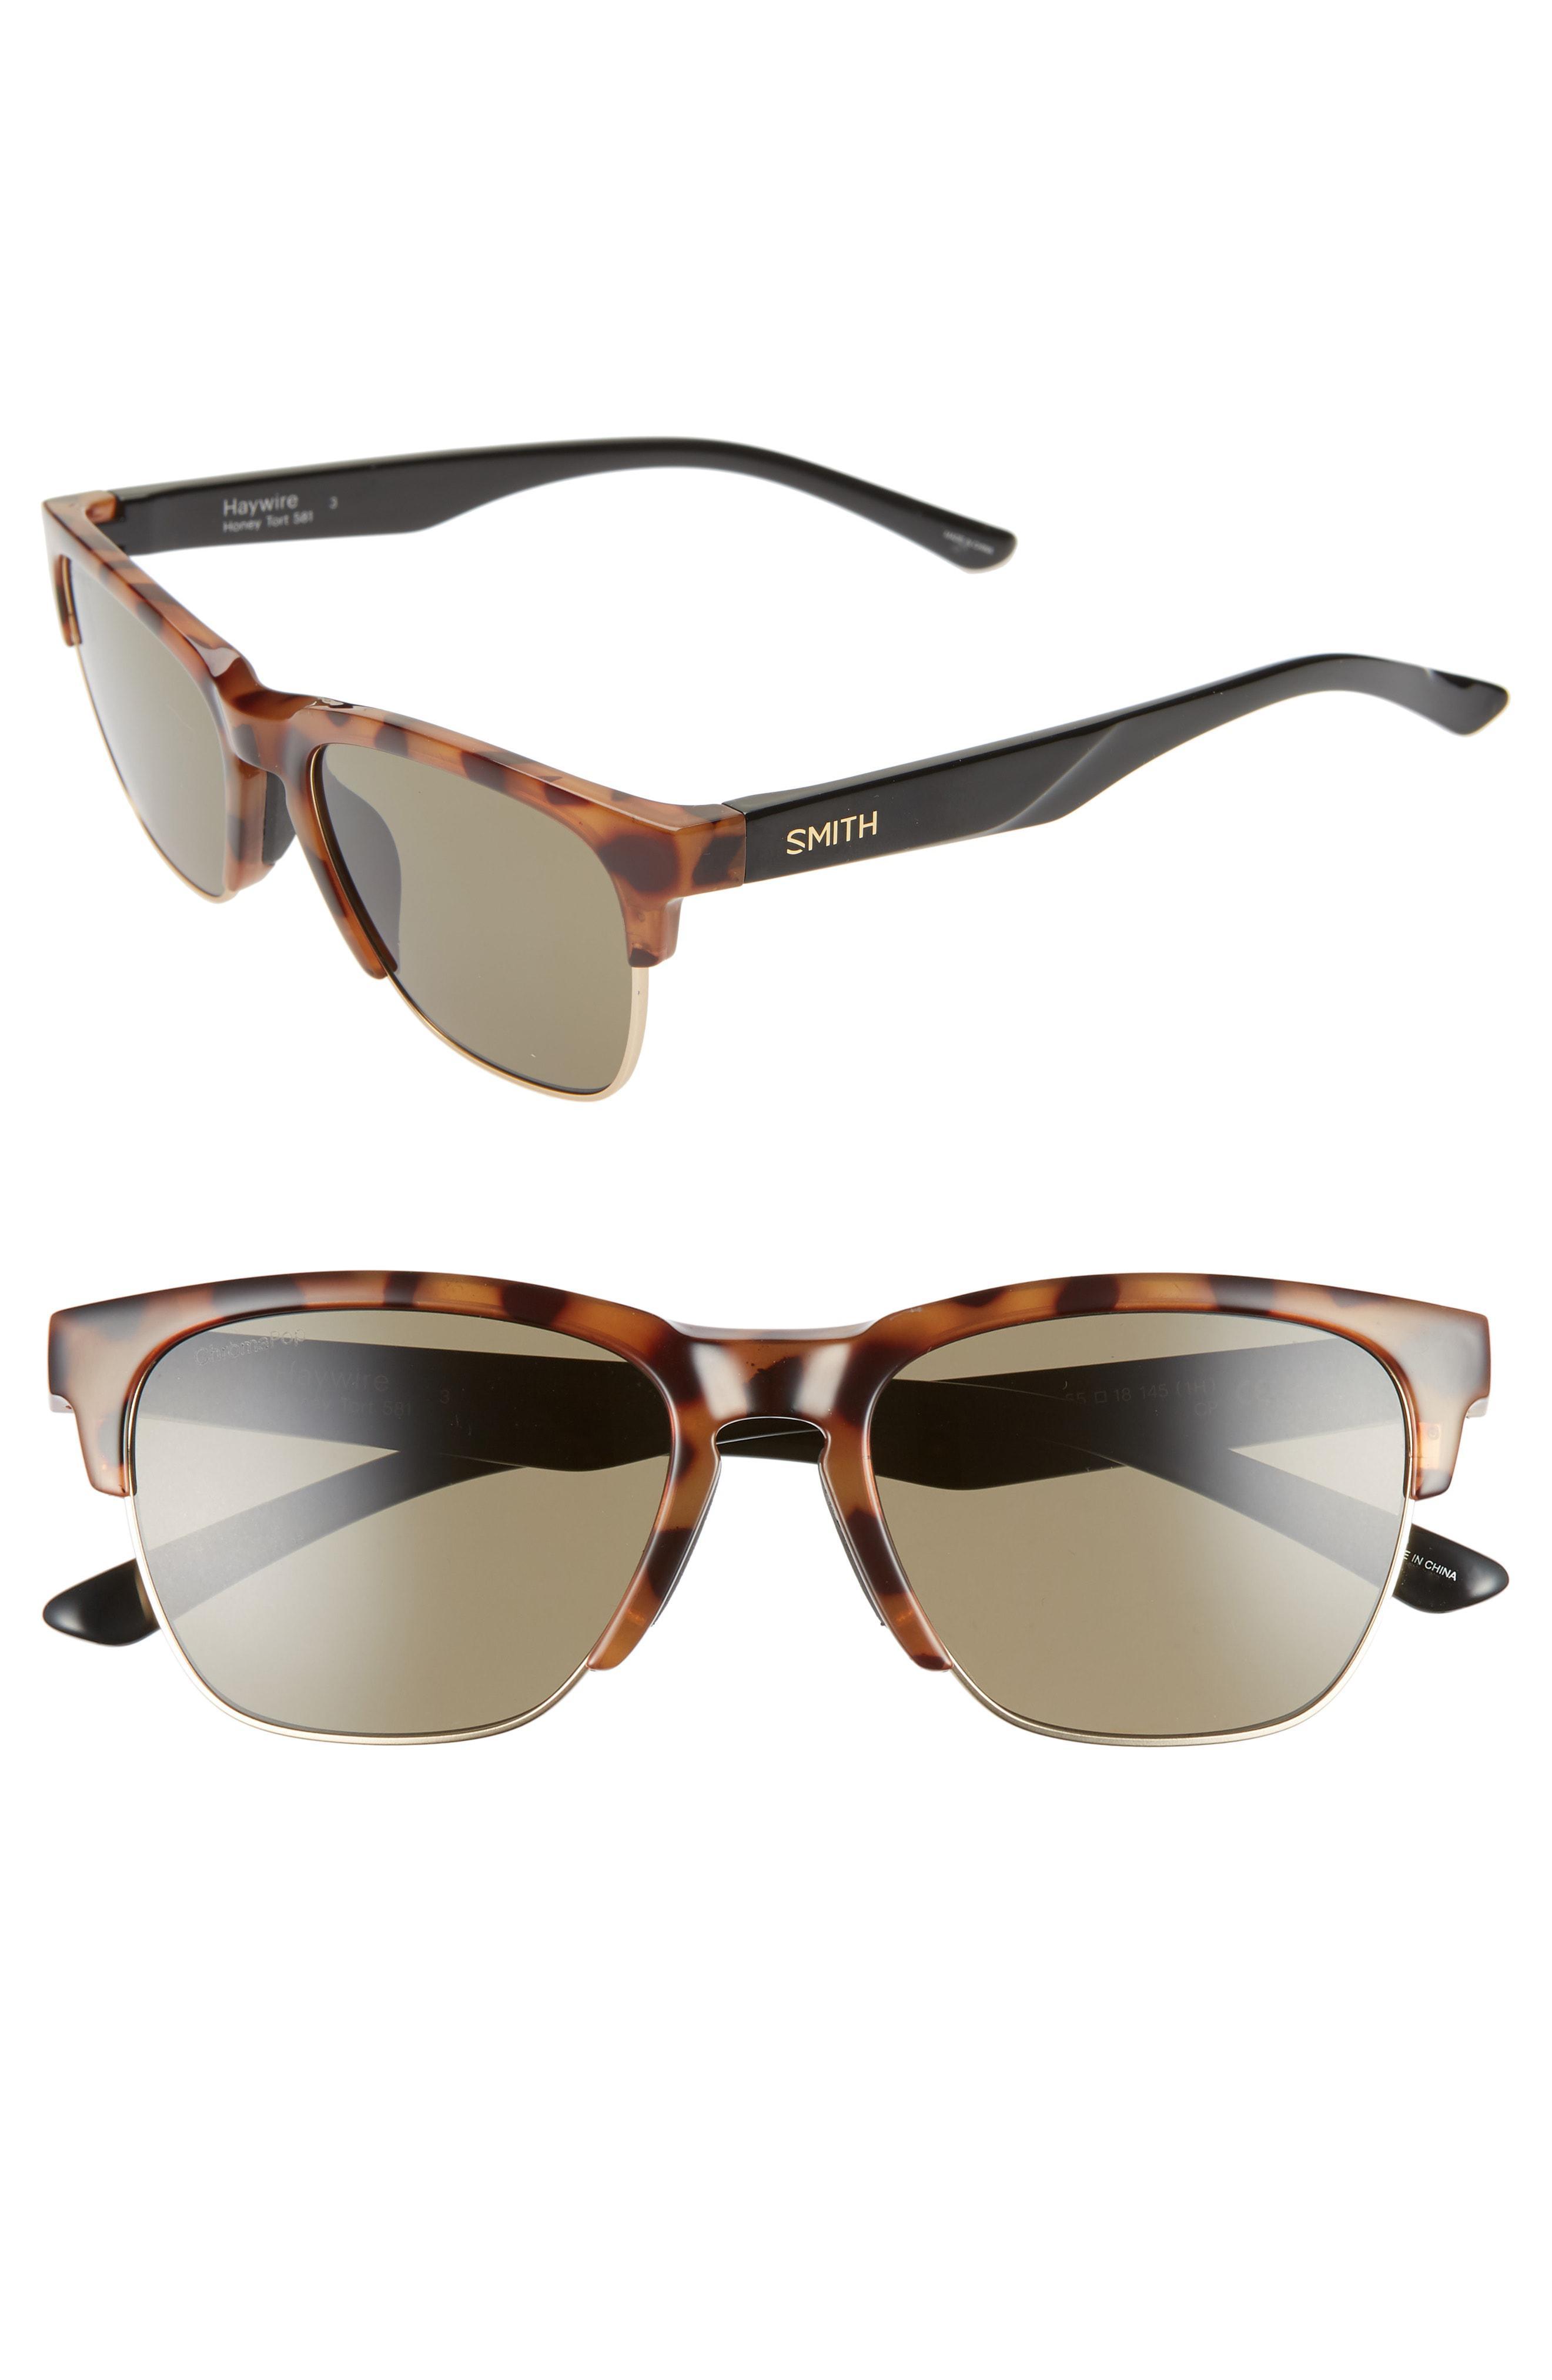 6d276f79535 Smith - Haywire 55mm Chromapop(tm) Polarized Sunglasses - Honey Tortoise   Green -. View fullscreen